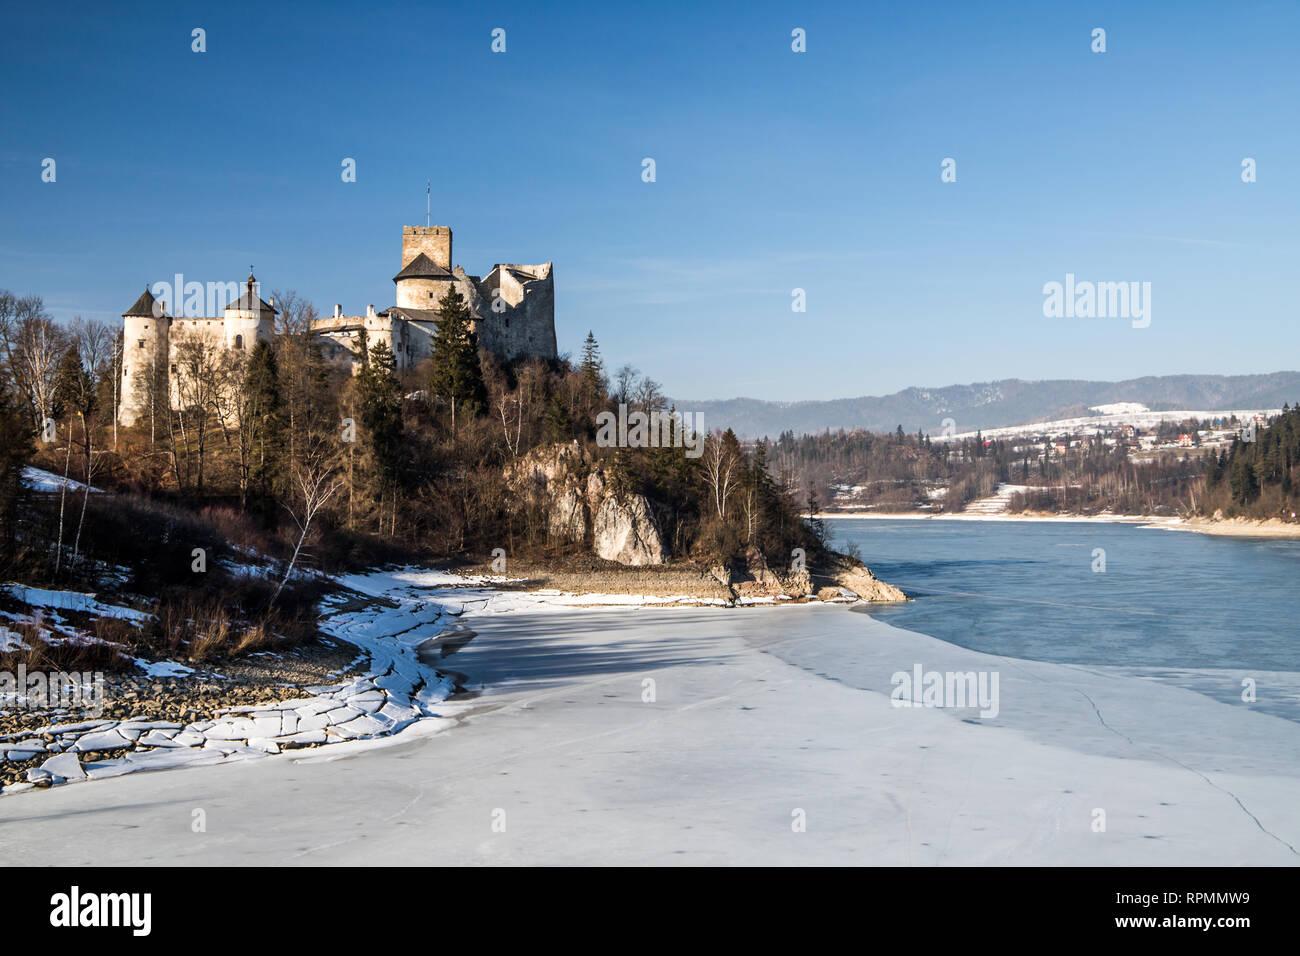 Dunajec Avance castillo en Niedzica, Polonia, Czorsztyn lago. Vista invernal. Foto de stock